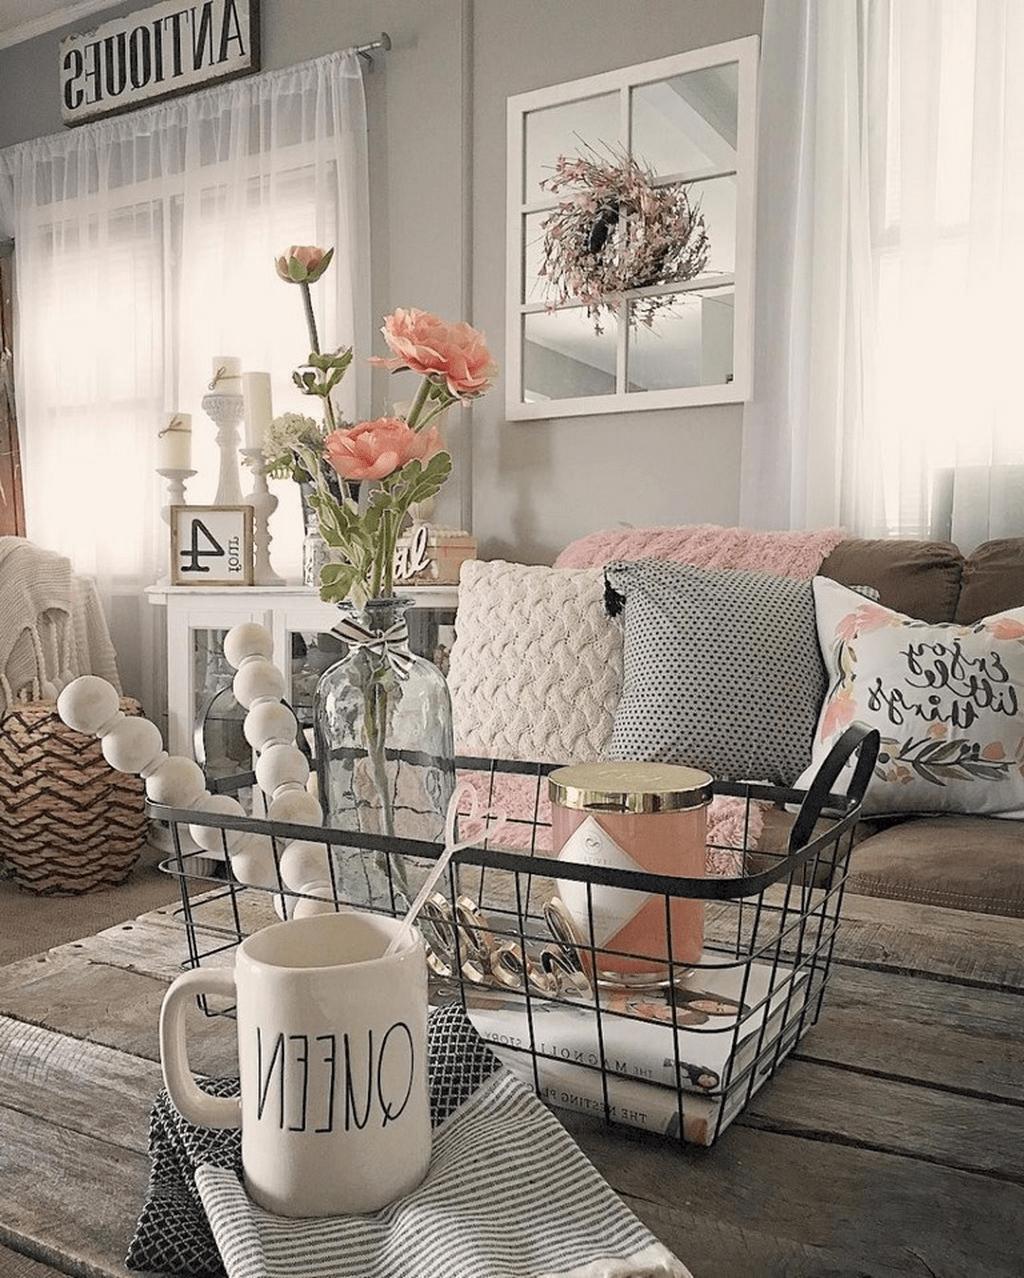 31 Inspiring Romantic Living Room Ideas For Valentine